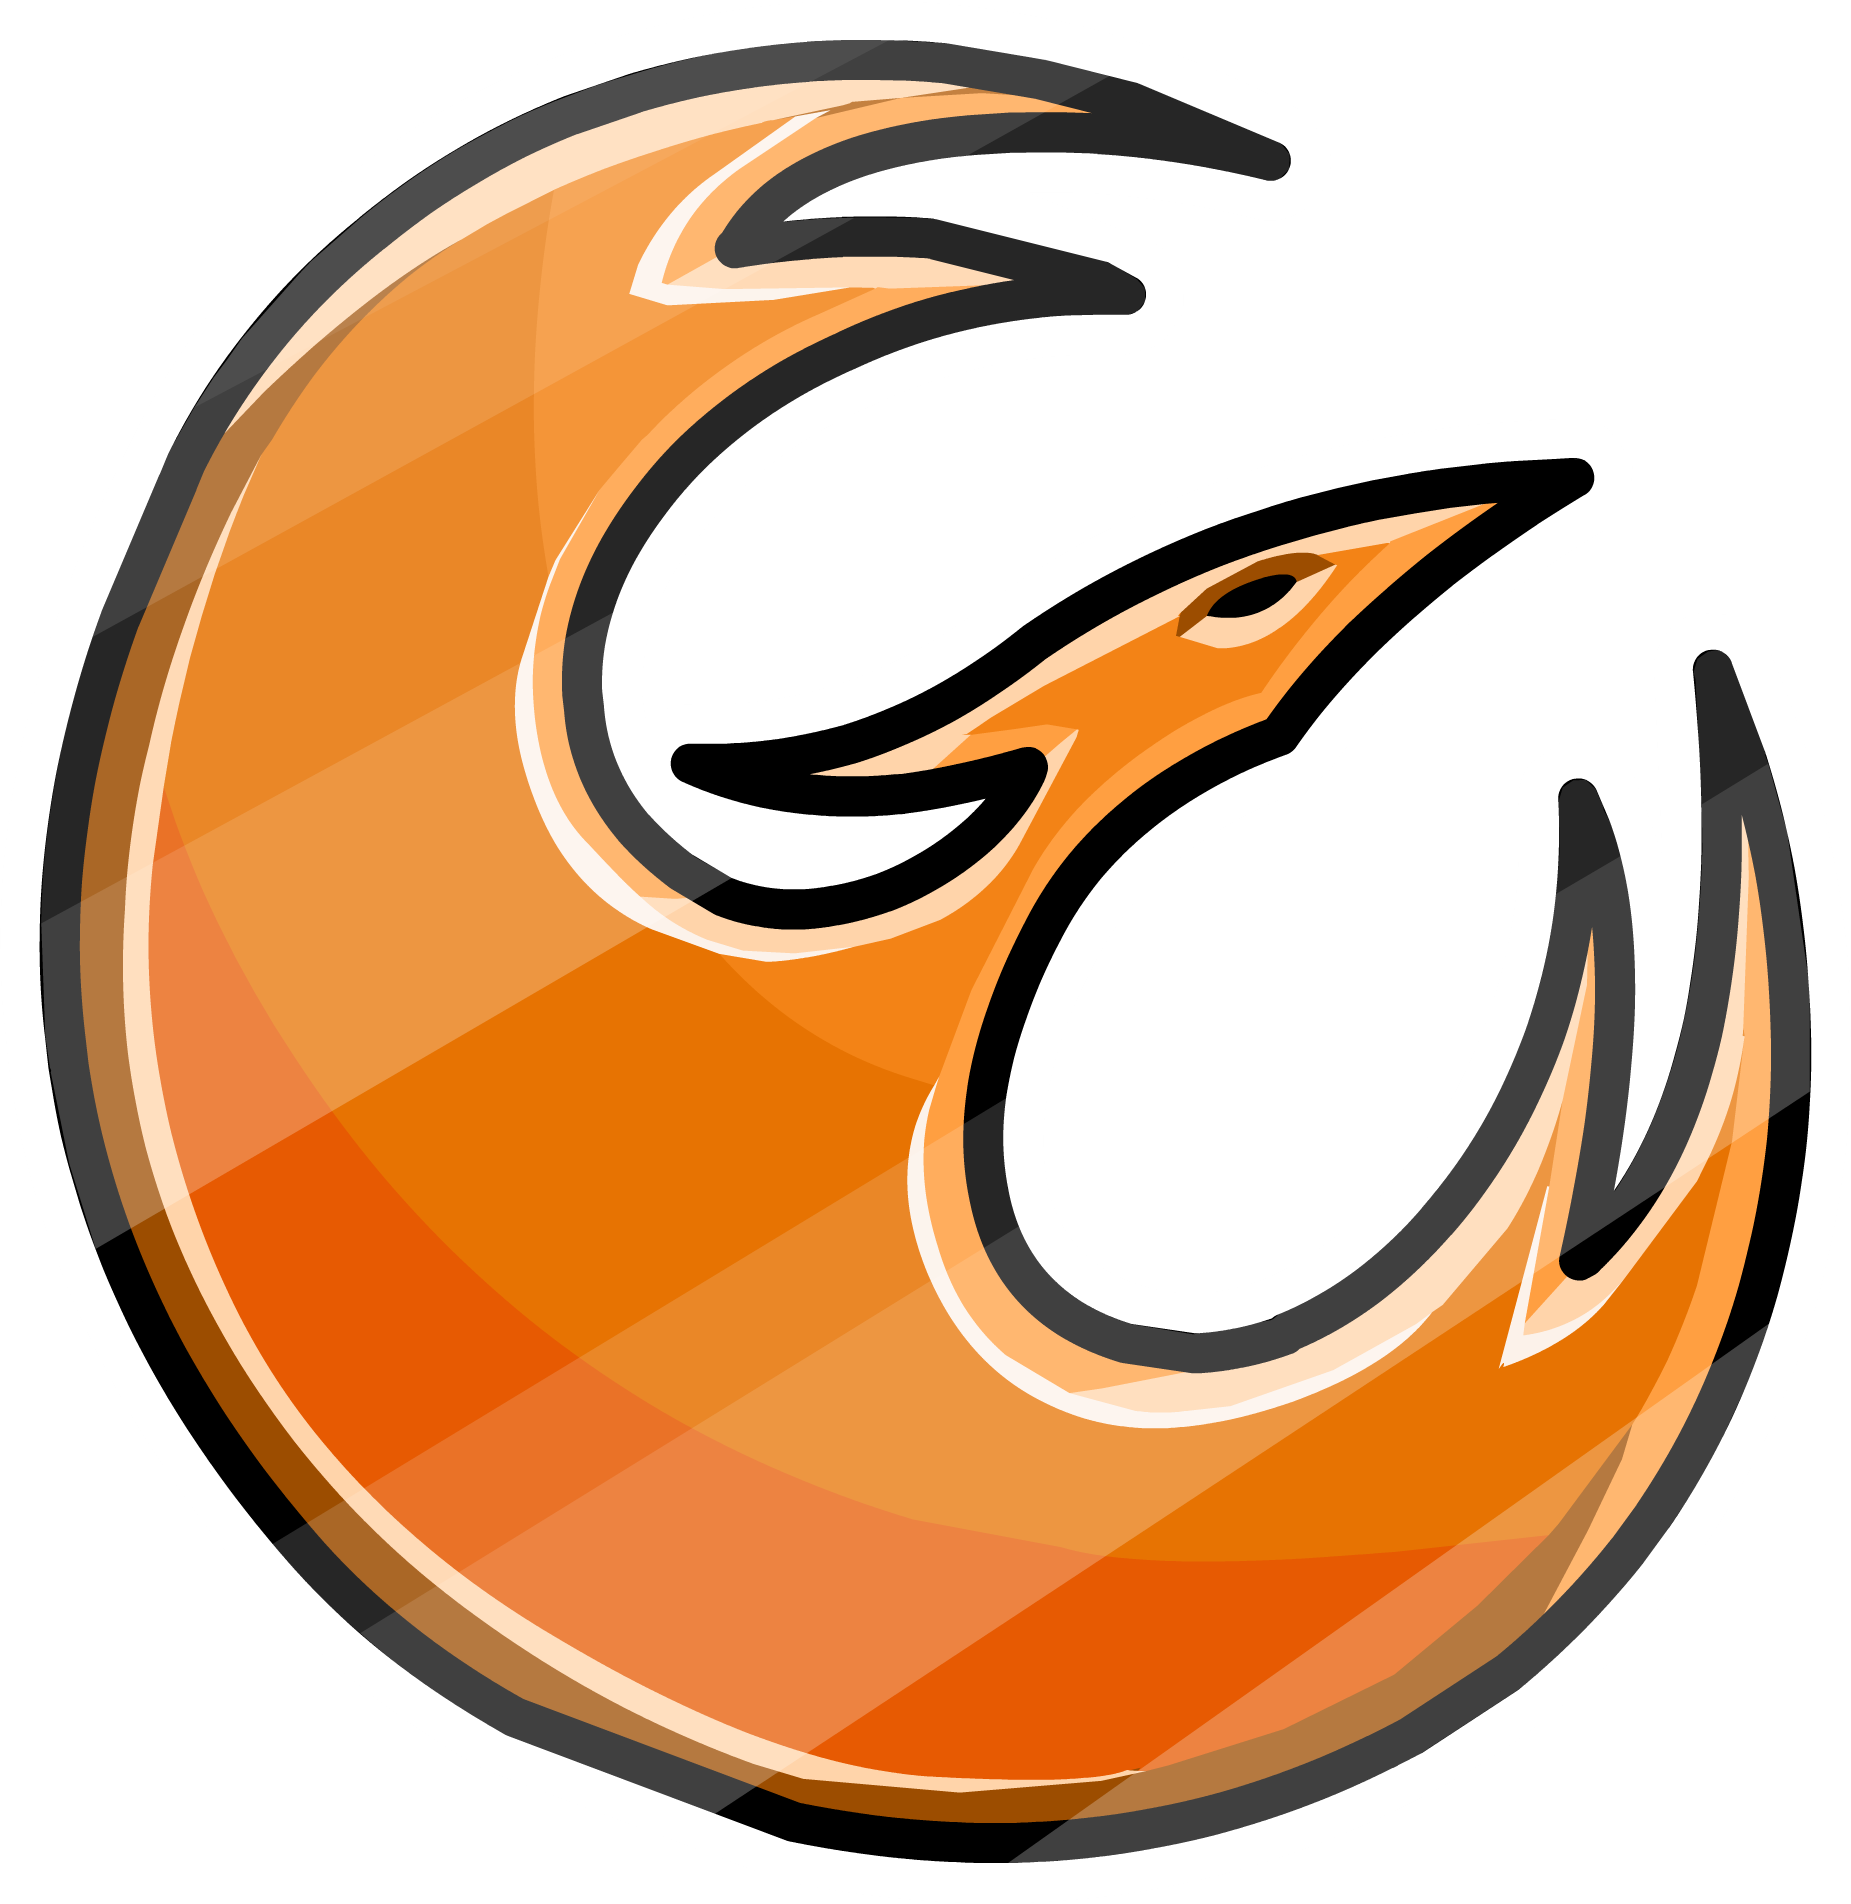 1851x1904 Rebel Alliance Club Penguin Wiki Fandom Powered By Wikia